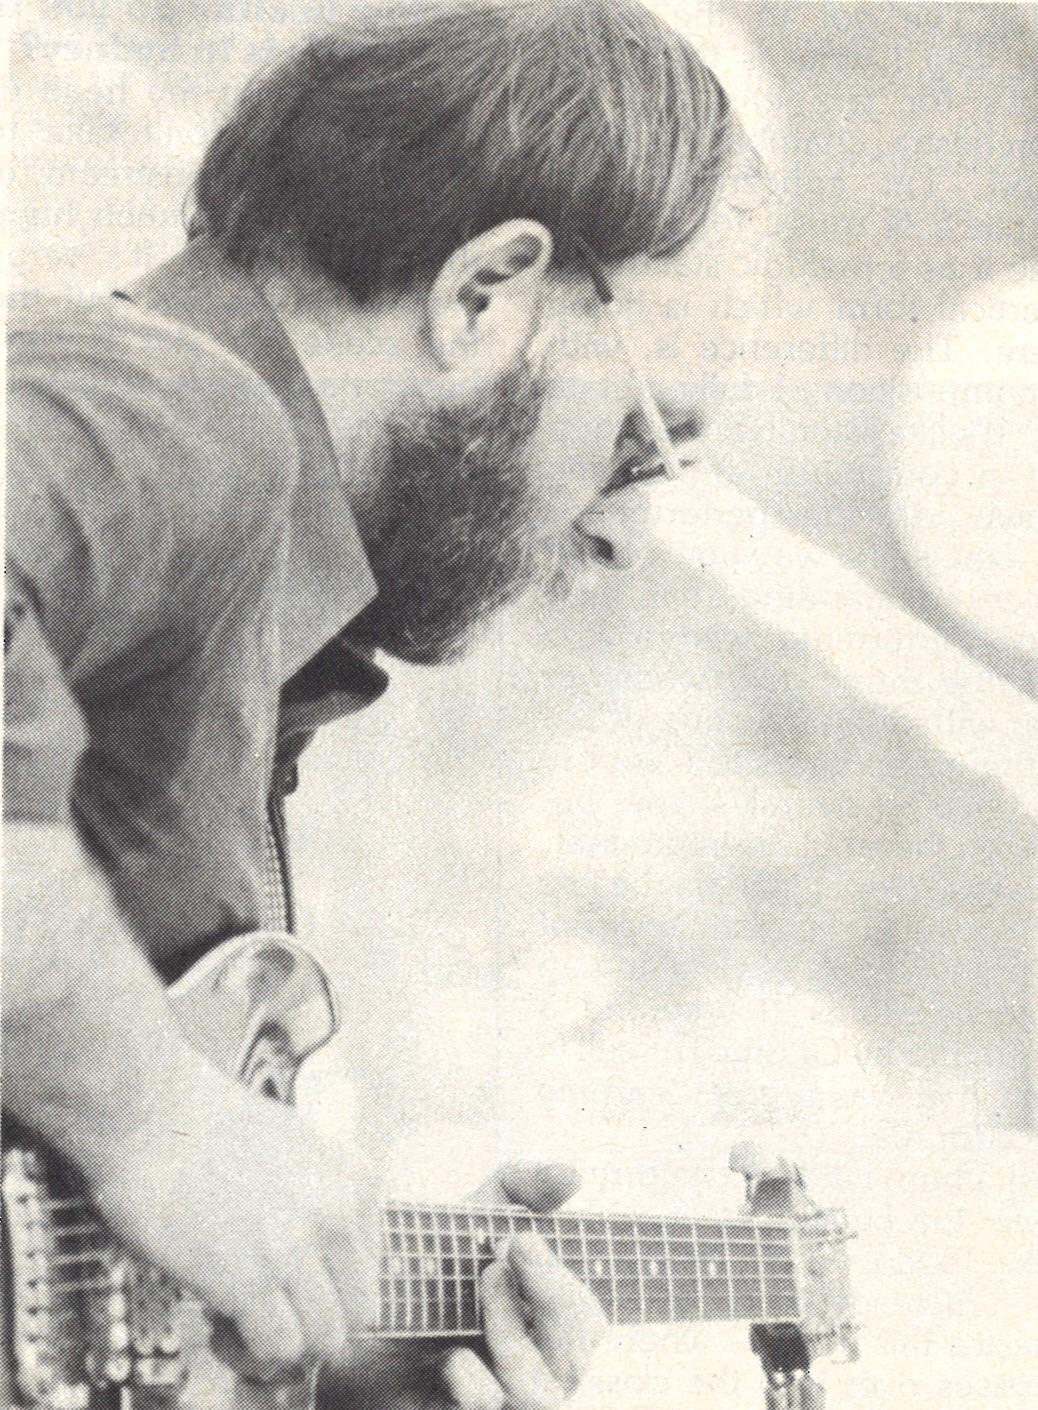 Peter Boothman